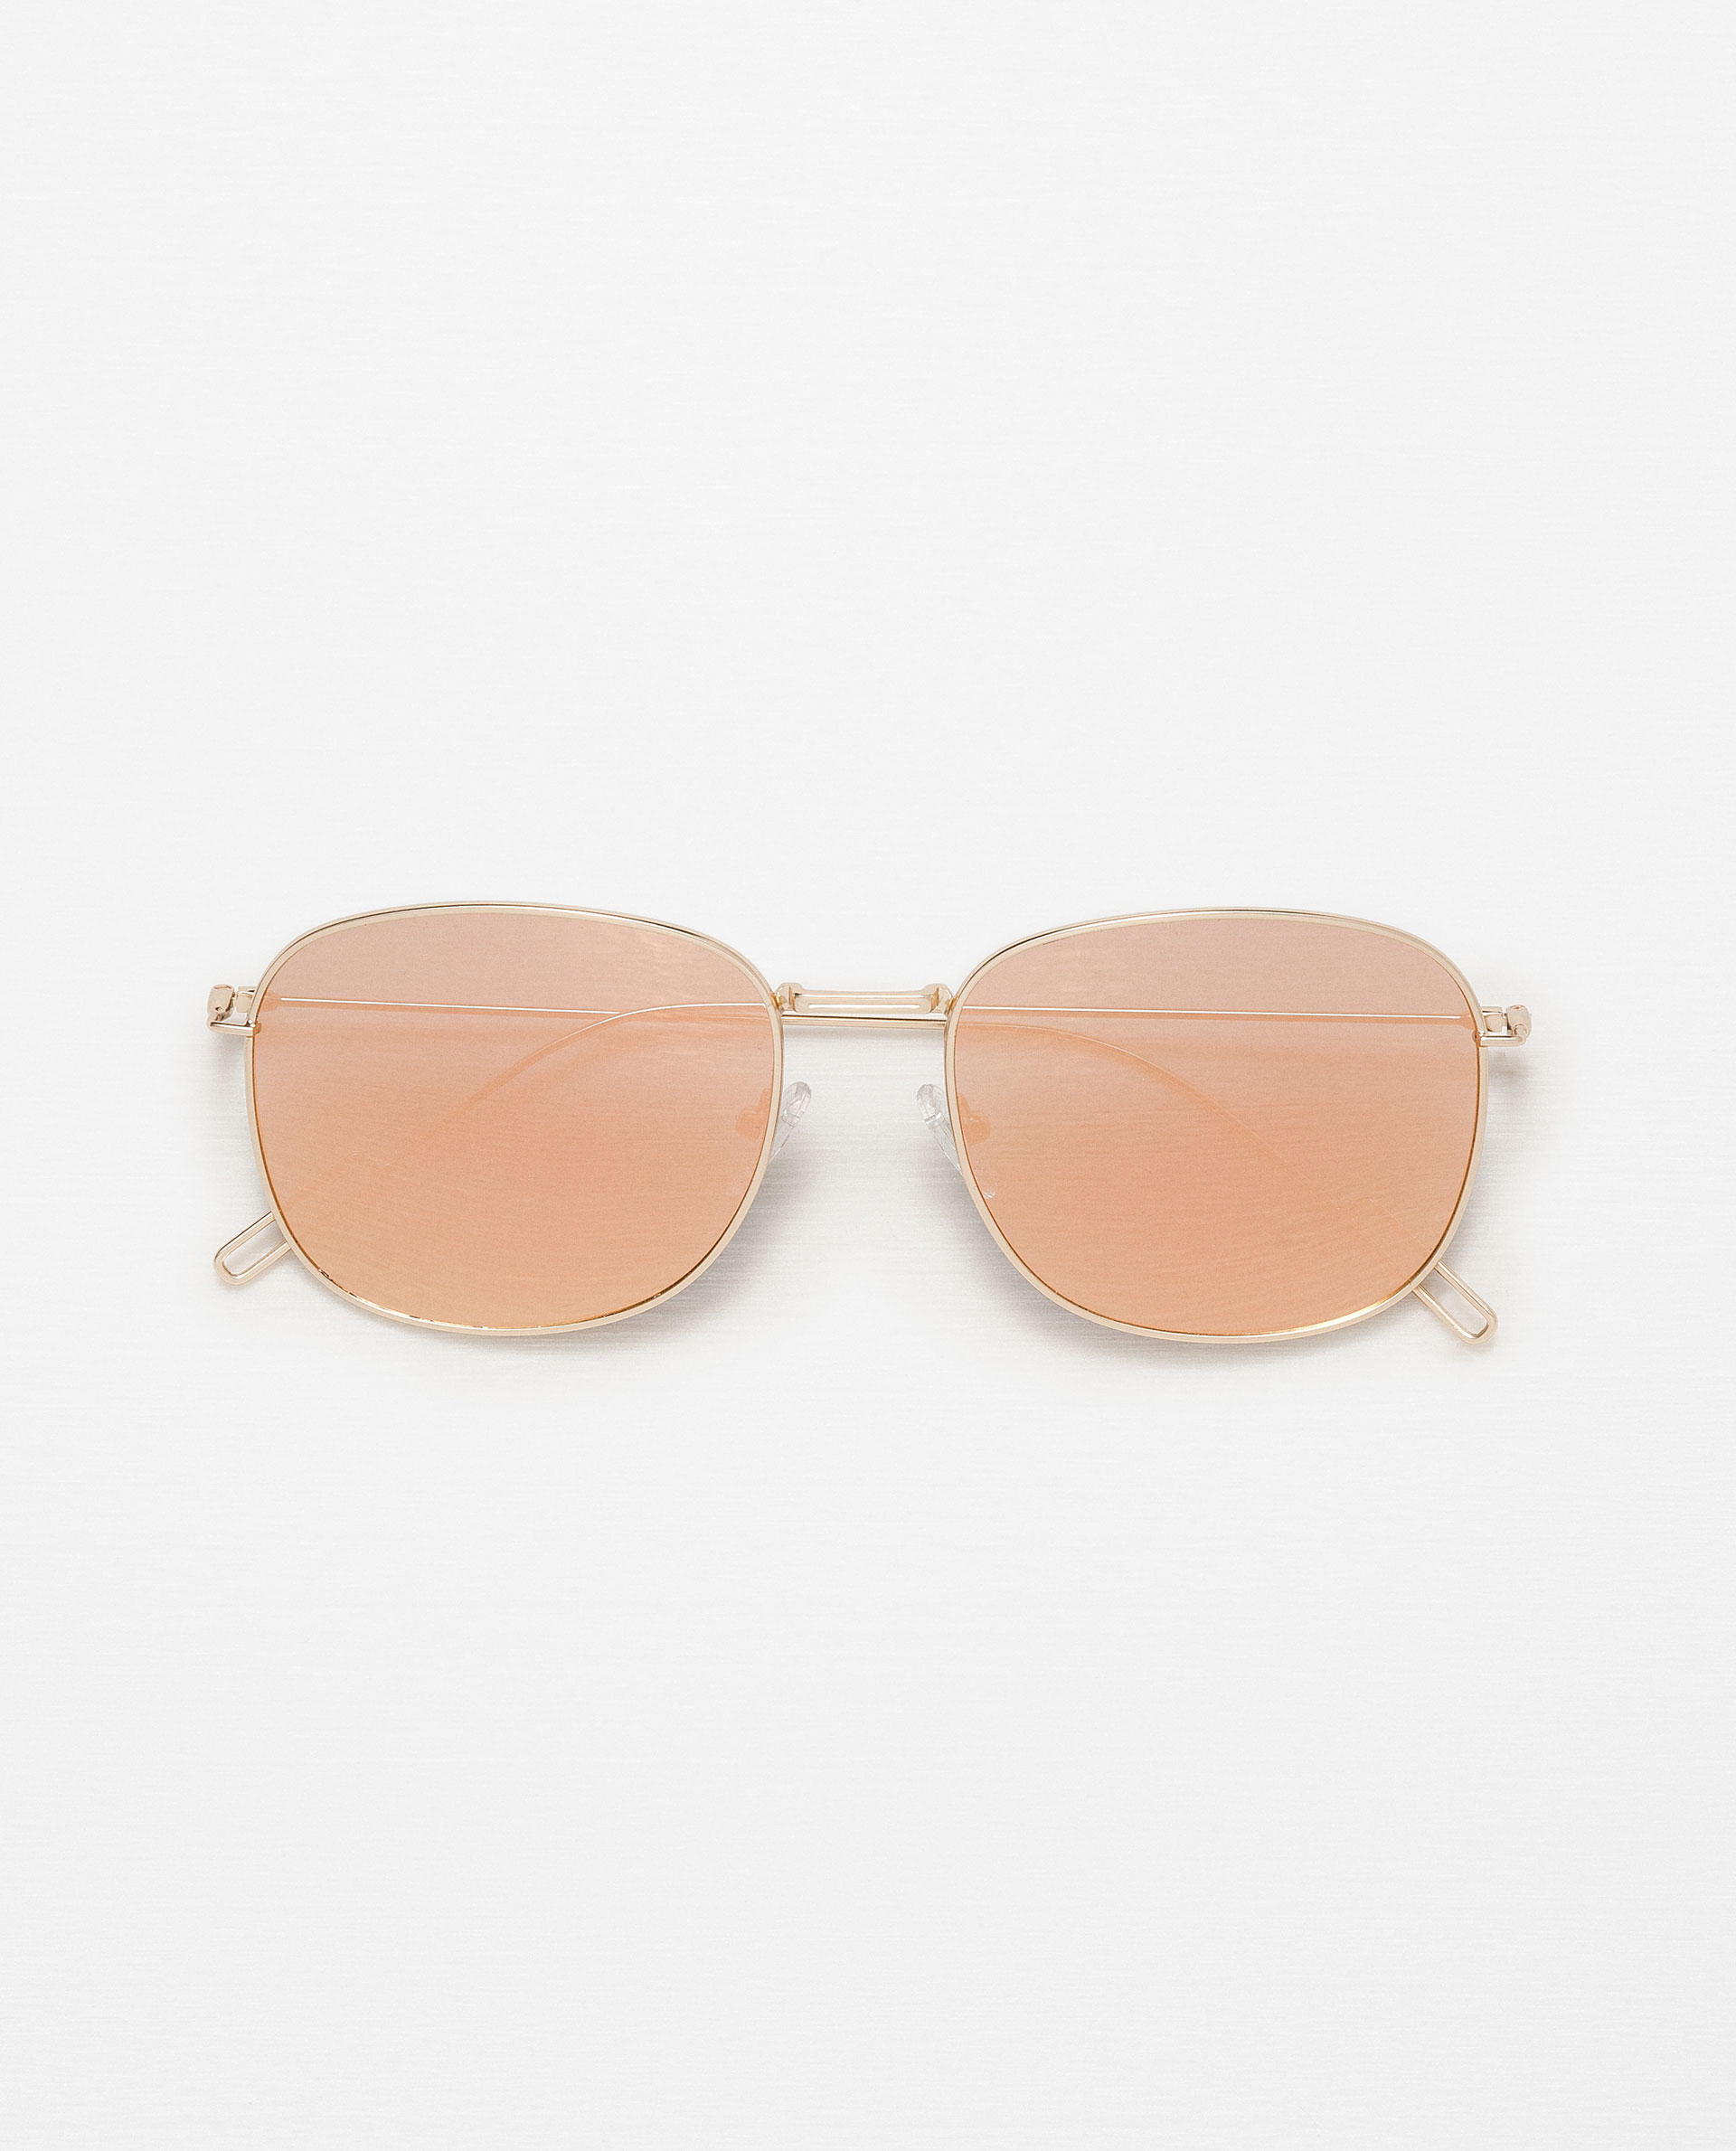 Zara Glasses Frames : Zara Sunglasses With Metal Frame Lyst